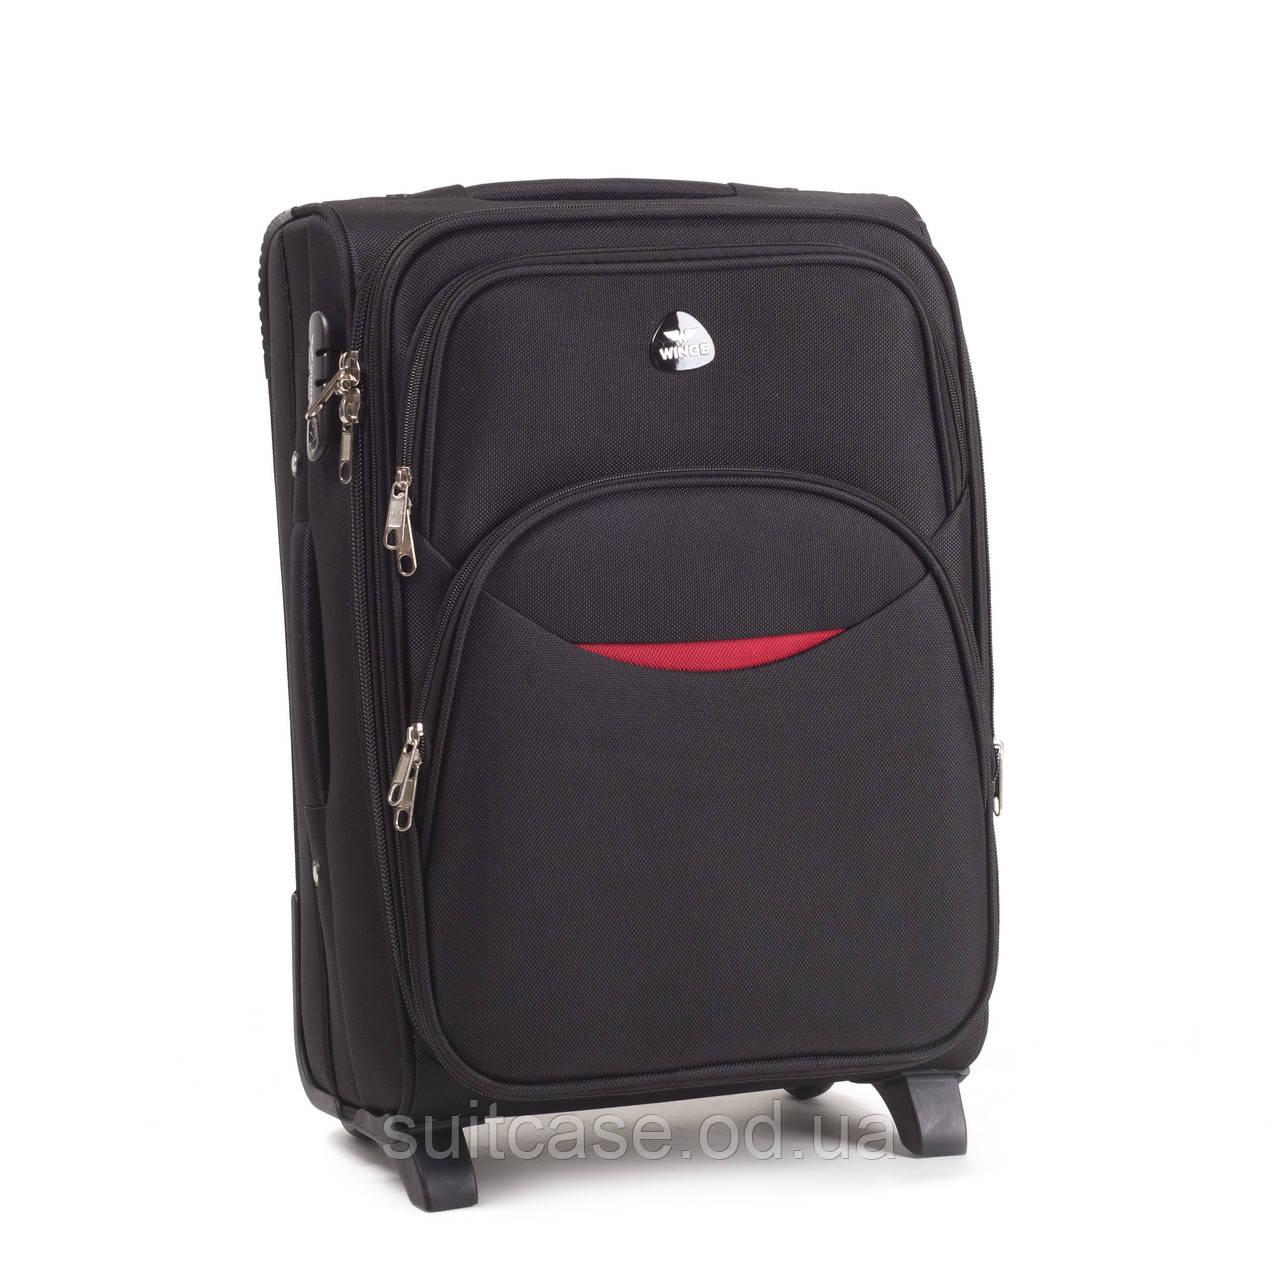 da4ae5cbf9b2 Малый чемодан-ручная кладь на 2-х колесах WINGS 1708 smile новинка -  Интернет